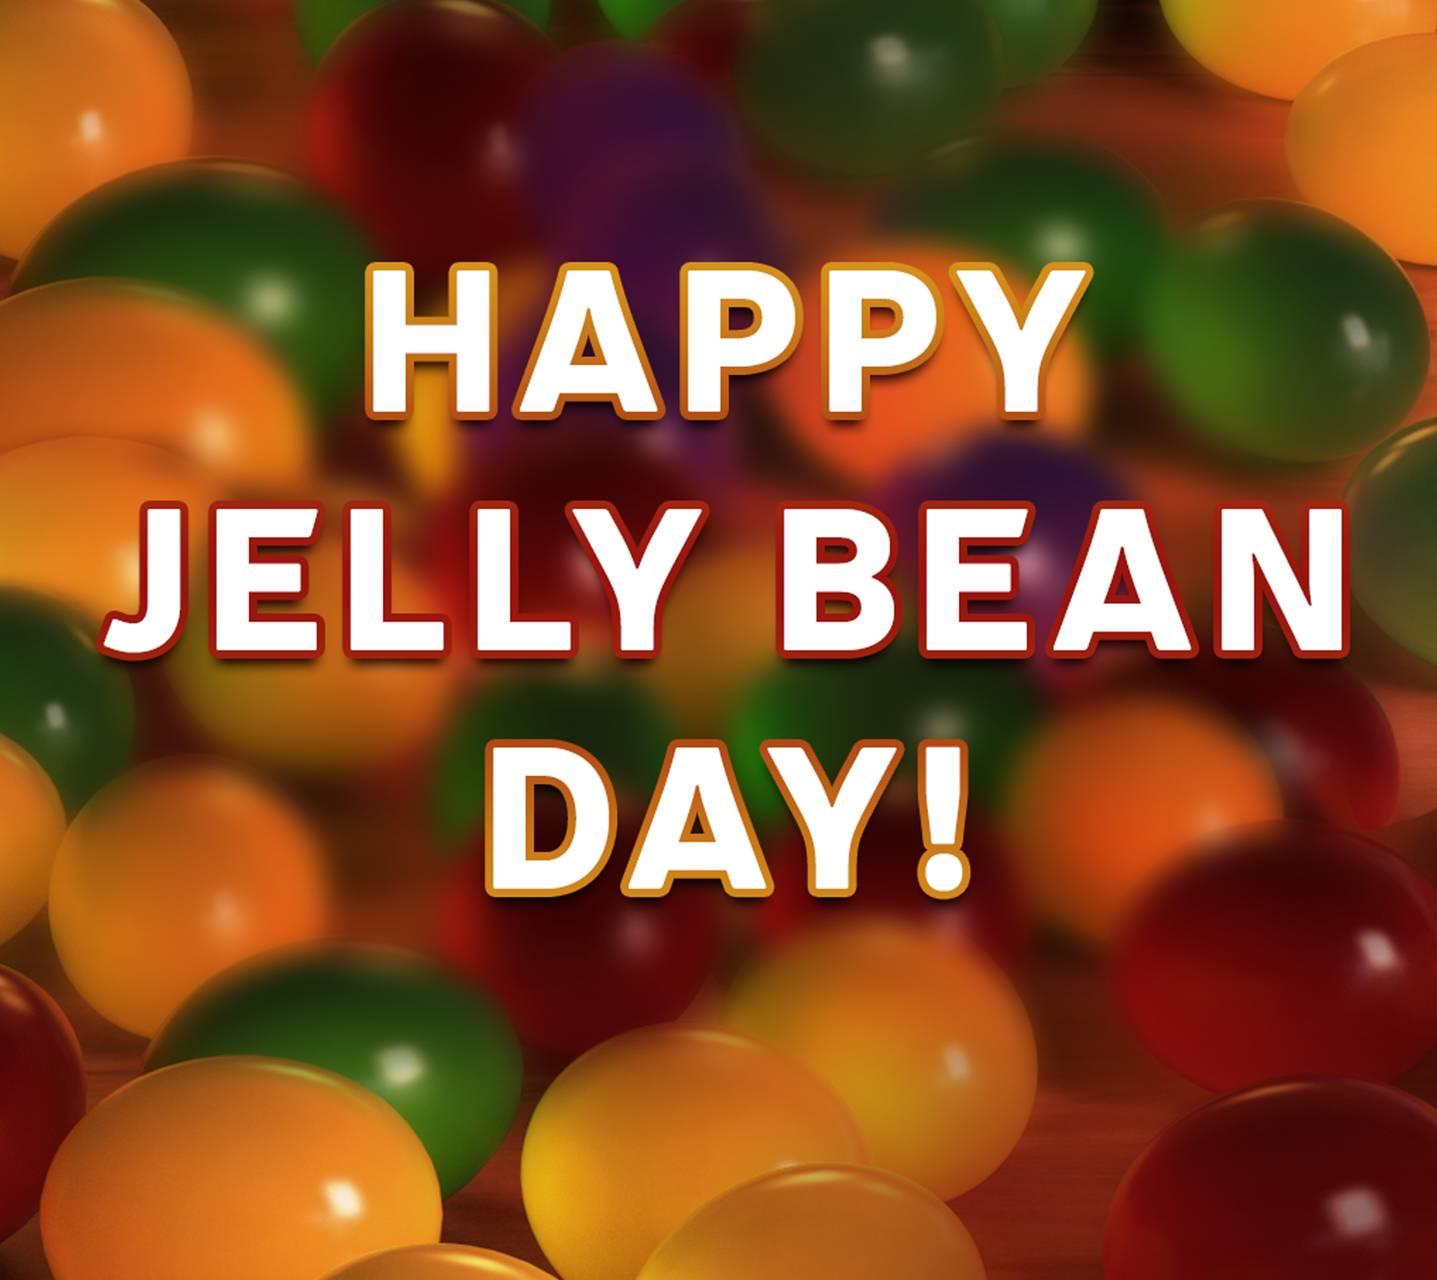 Happy Jelly Bean Day